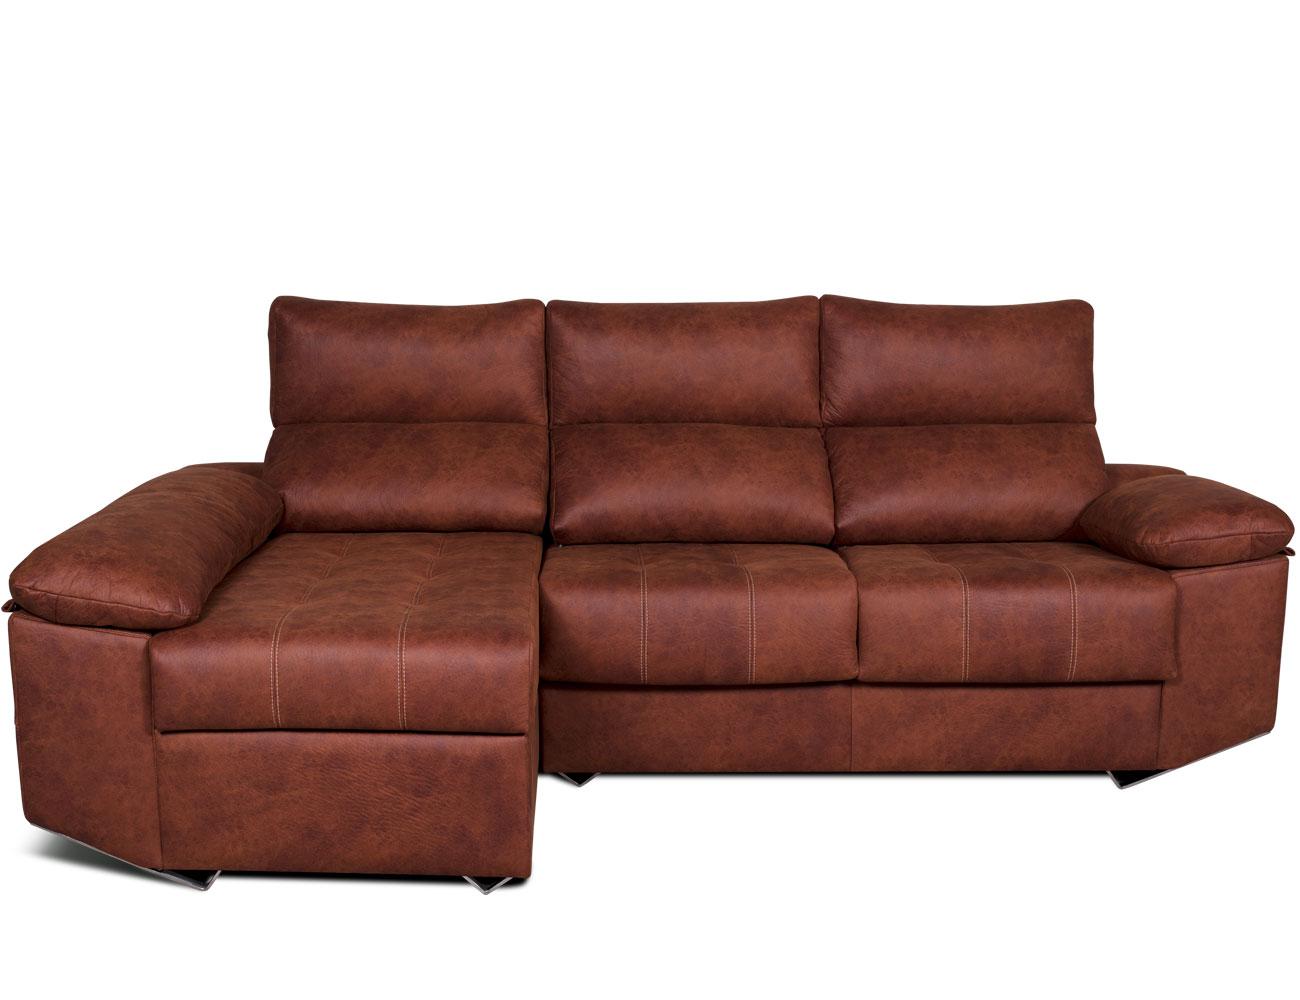 Sofa chaiselongue moderno patas forma tejido anti manchas 213